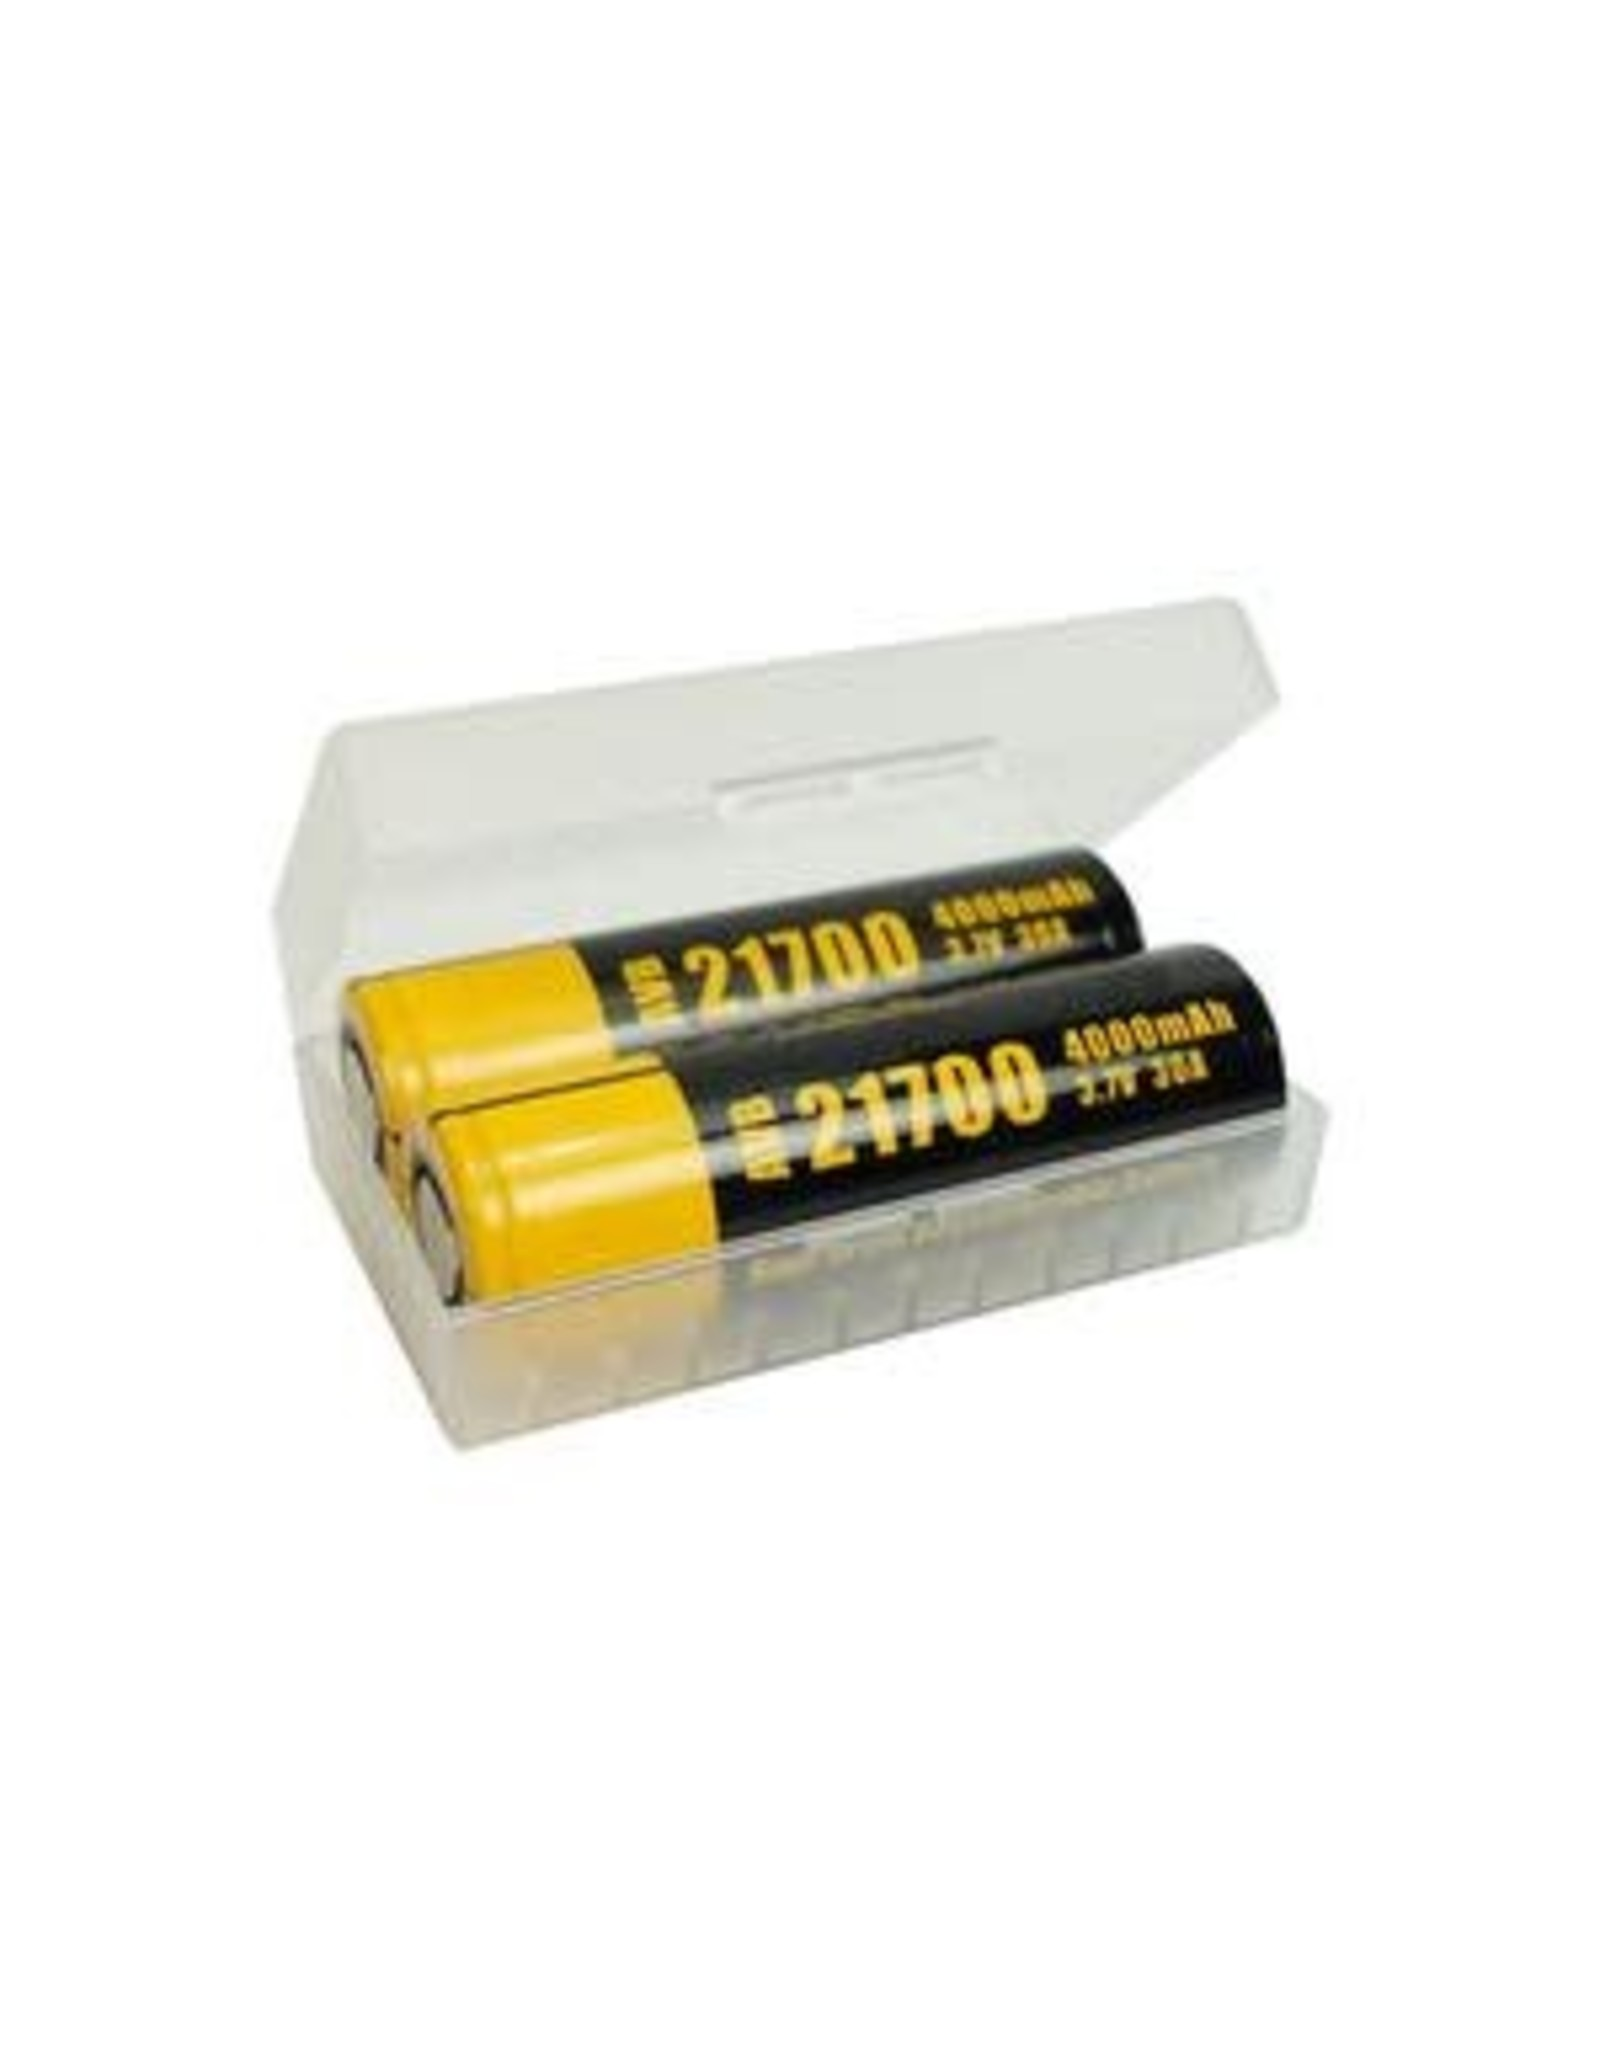 Iwodevape 20700/21700 Battery Case (2 Bay)